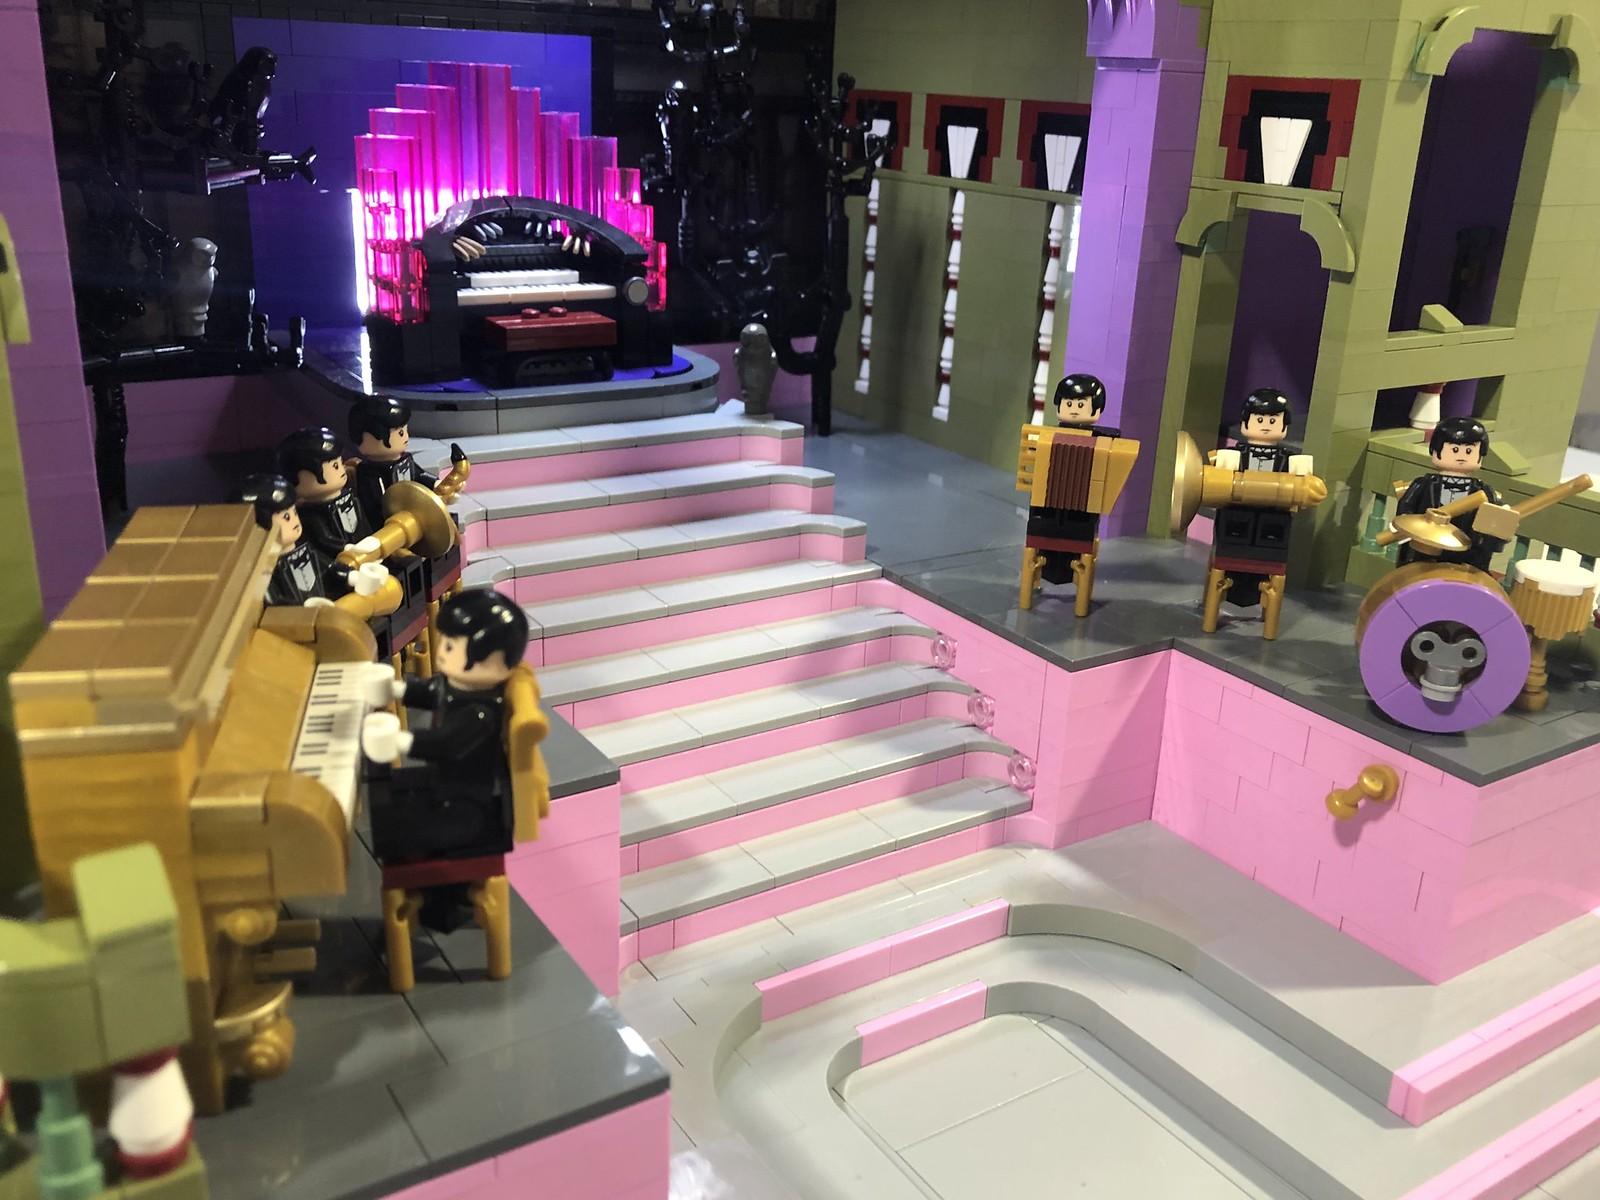 Dr Phibes Lego MOC